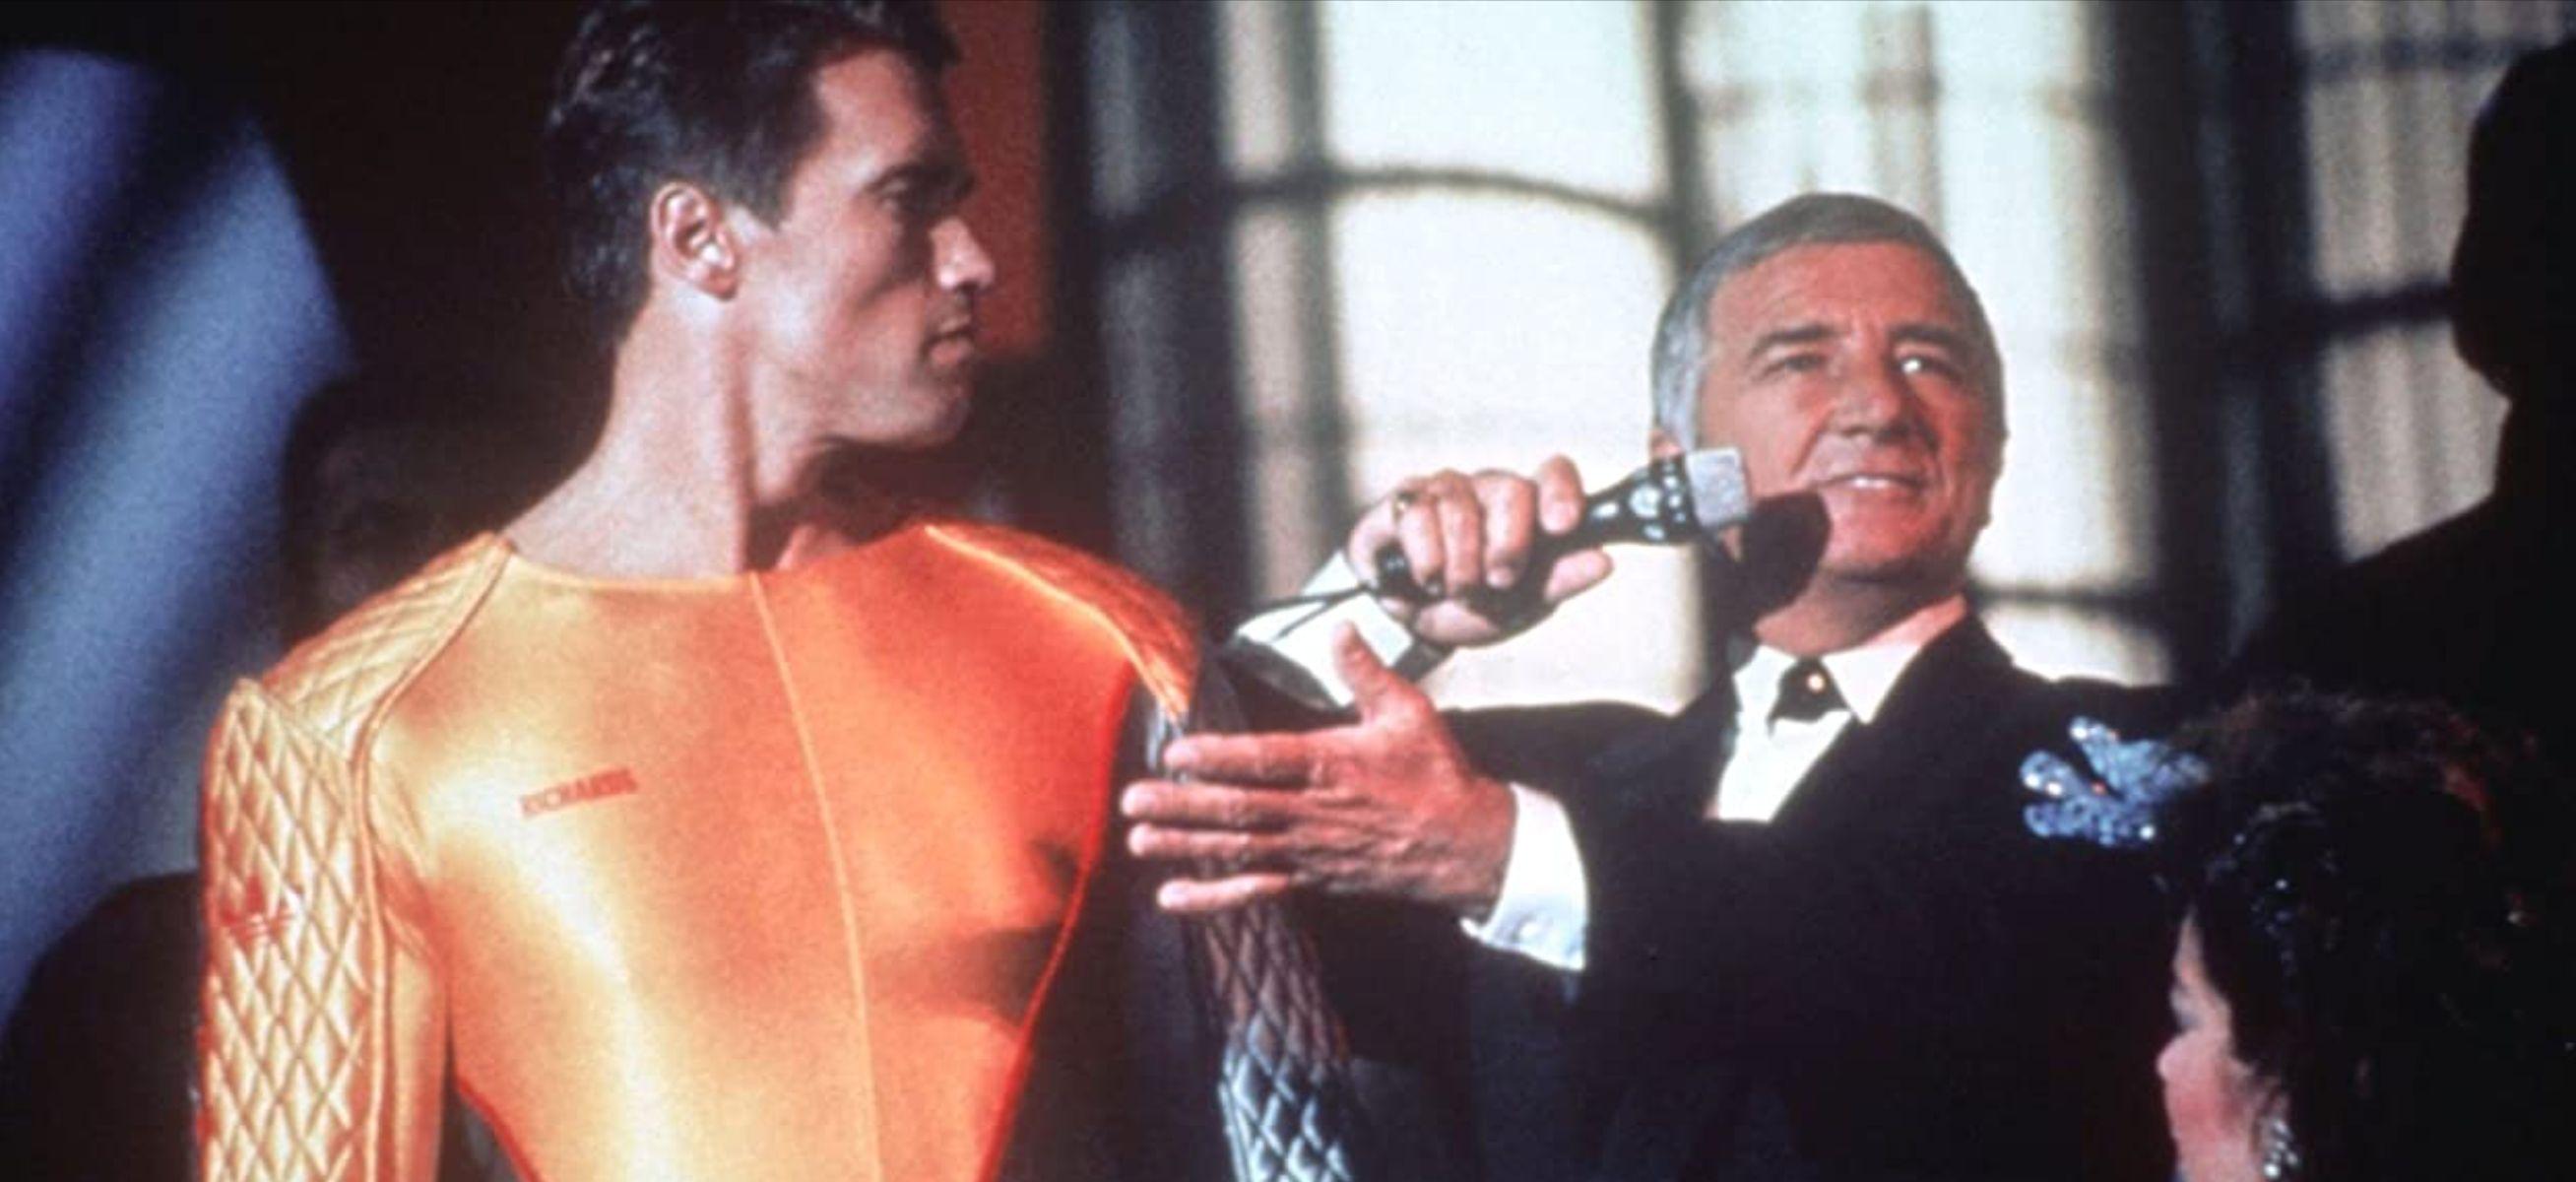 Arnold Schwarzenegger,魷魚遊戲,網飛,魔鬼阿諾,大逃殺,小津安二郎,史蒂芬金,媒體,Richard Dawson,階級,社會議題